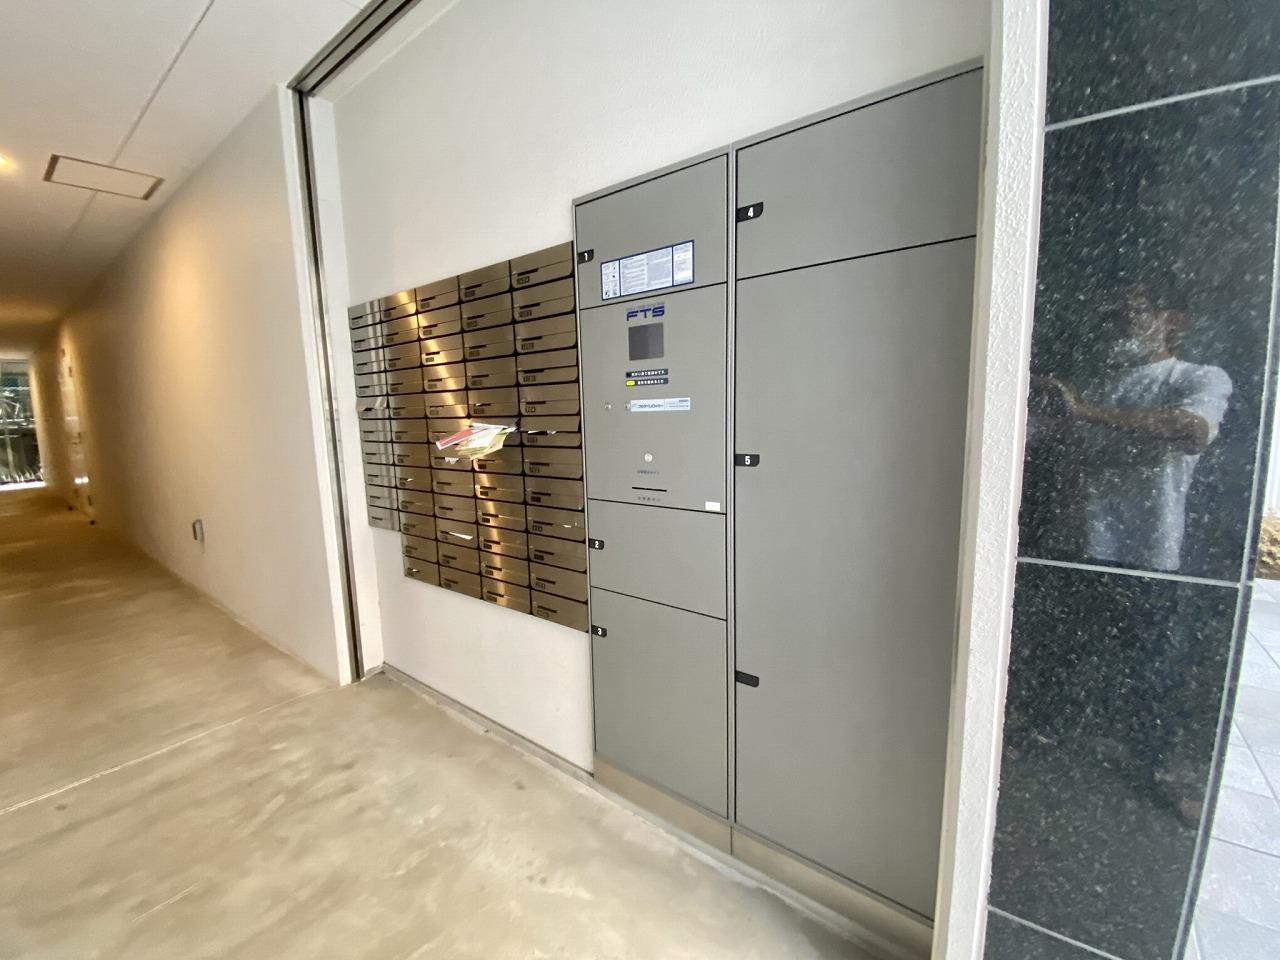 ★Sステイ三宮ルミナージュ★10階★浴室暖房乾燥機付き